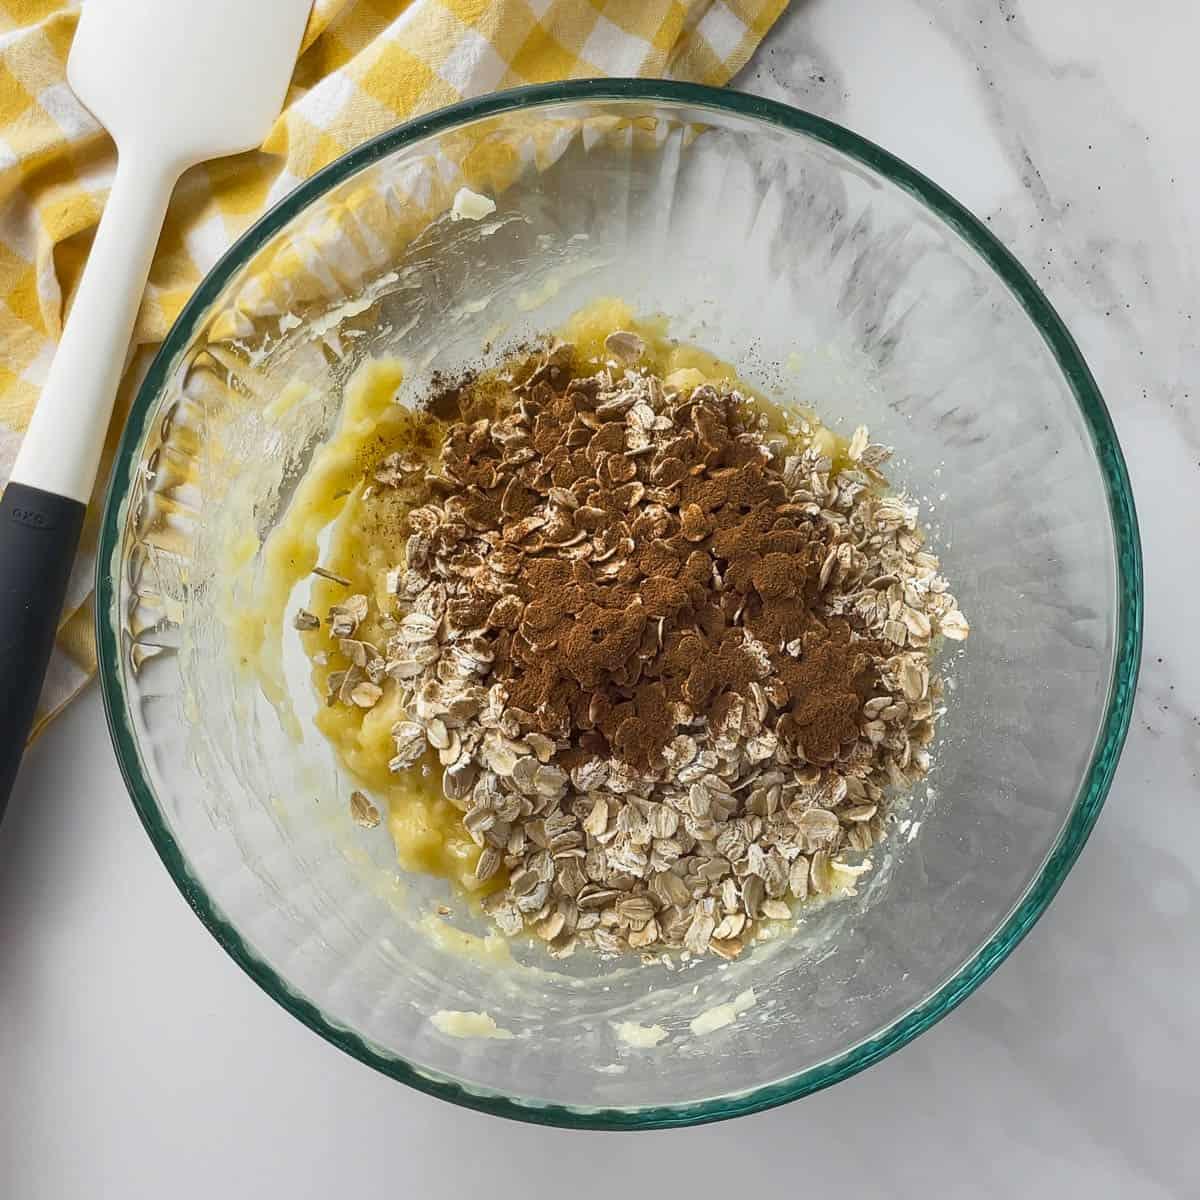 mashed banana, oatmeal, and cinnamon in mixing bowl